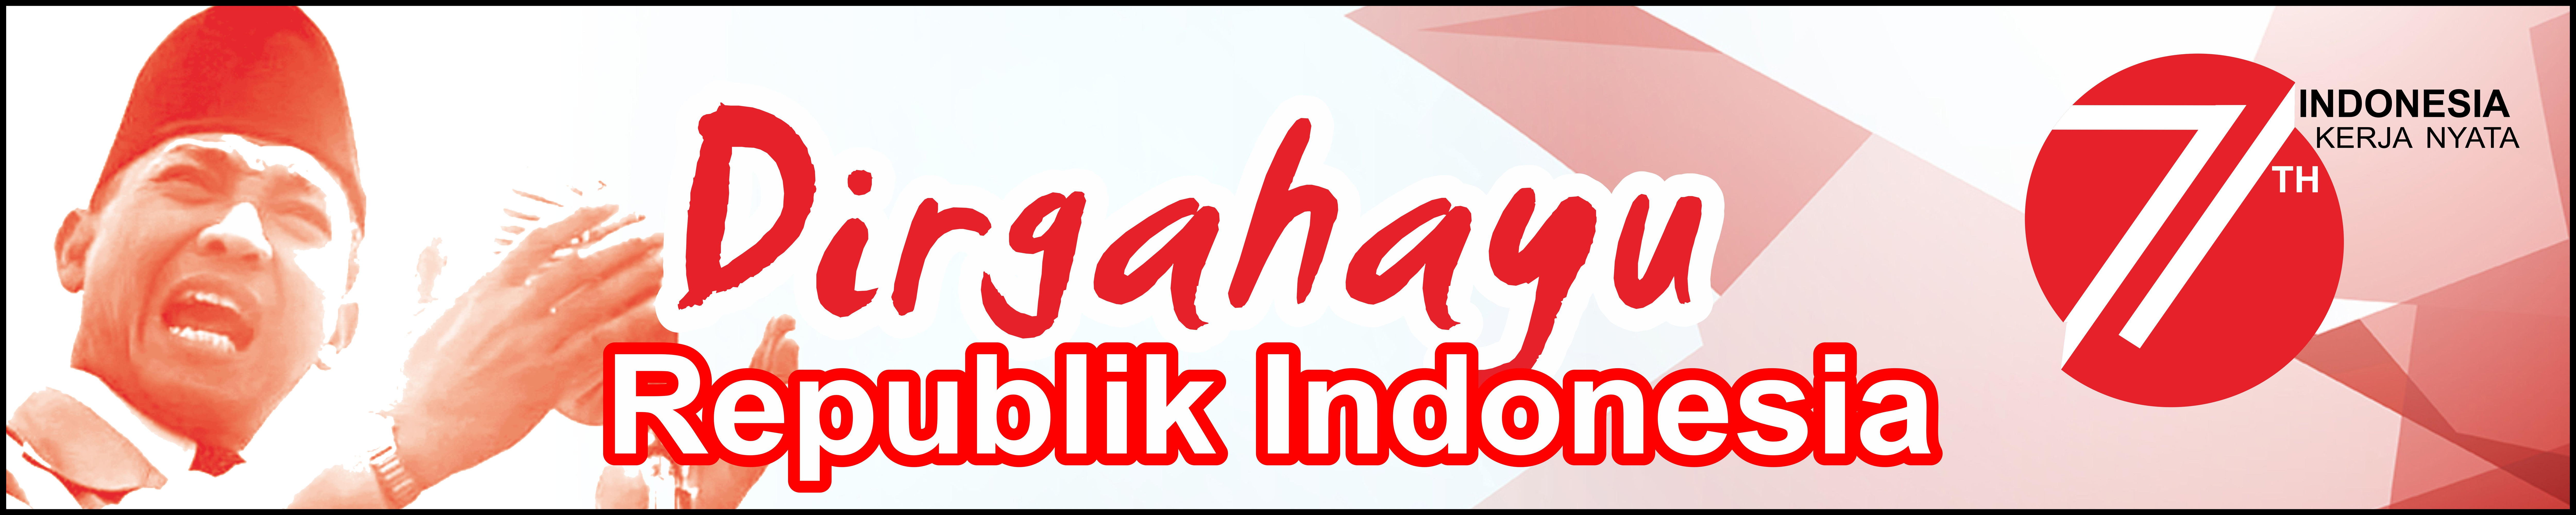 Banner 17 Agustus HUT RI 71 Tahun 2016 Free Download Spanduk